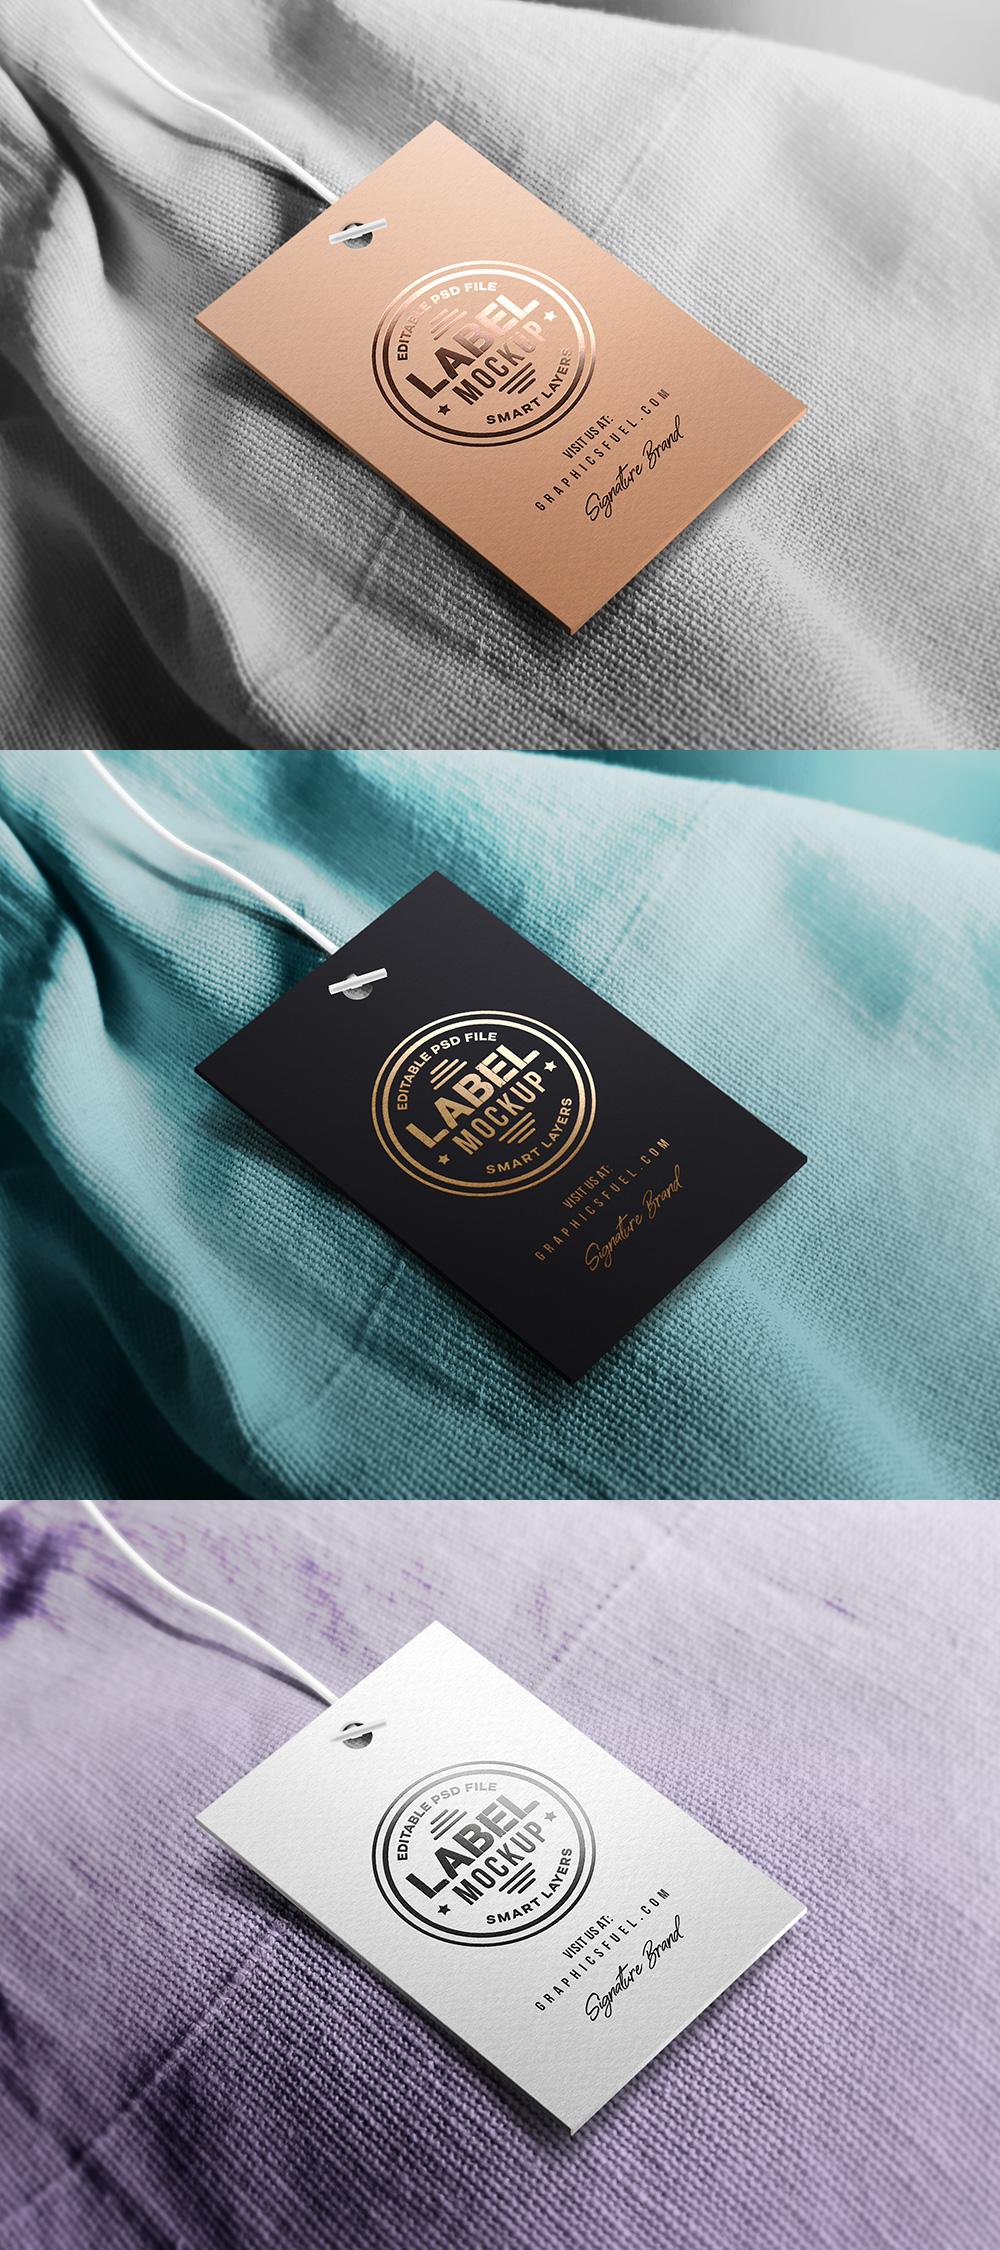 Мокап картонной бирки. clothing tag mockup